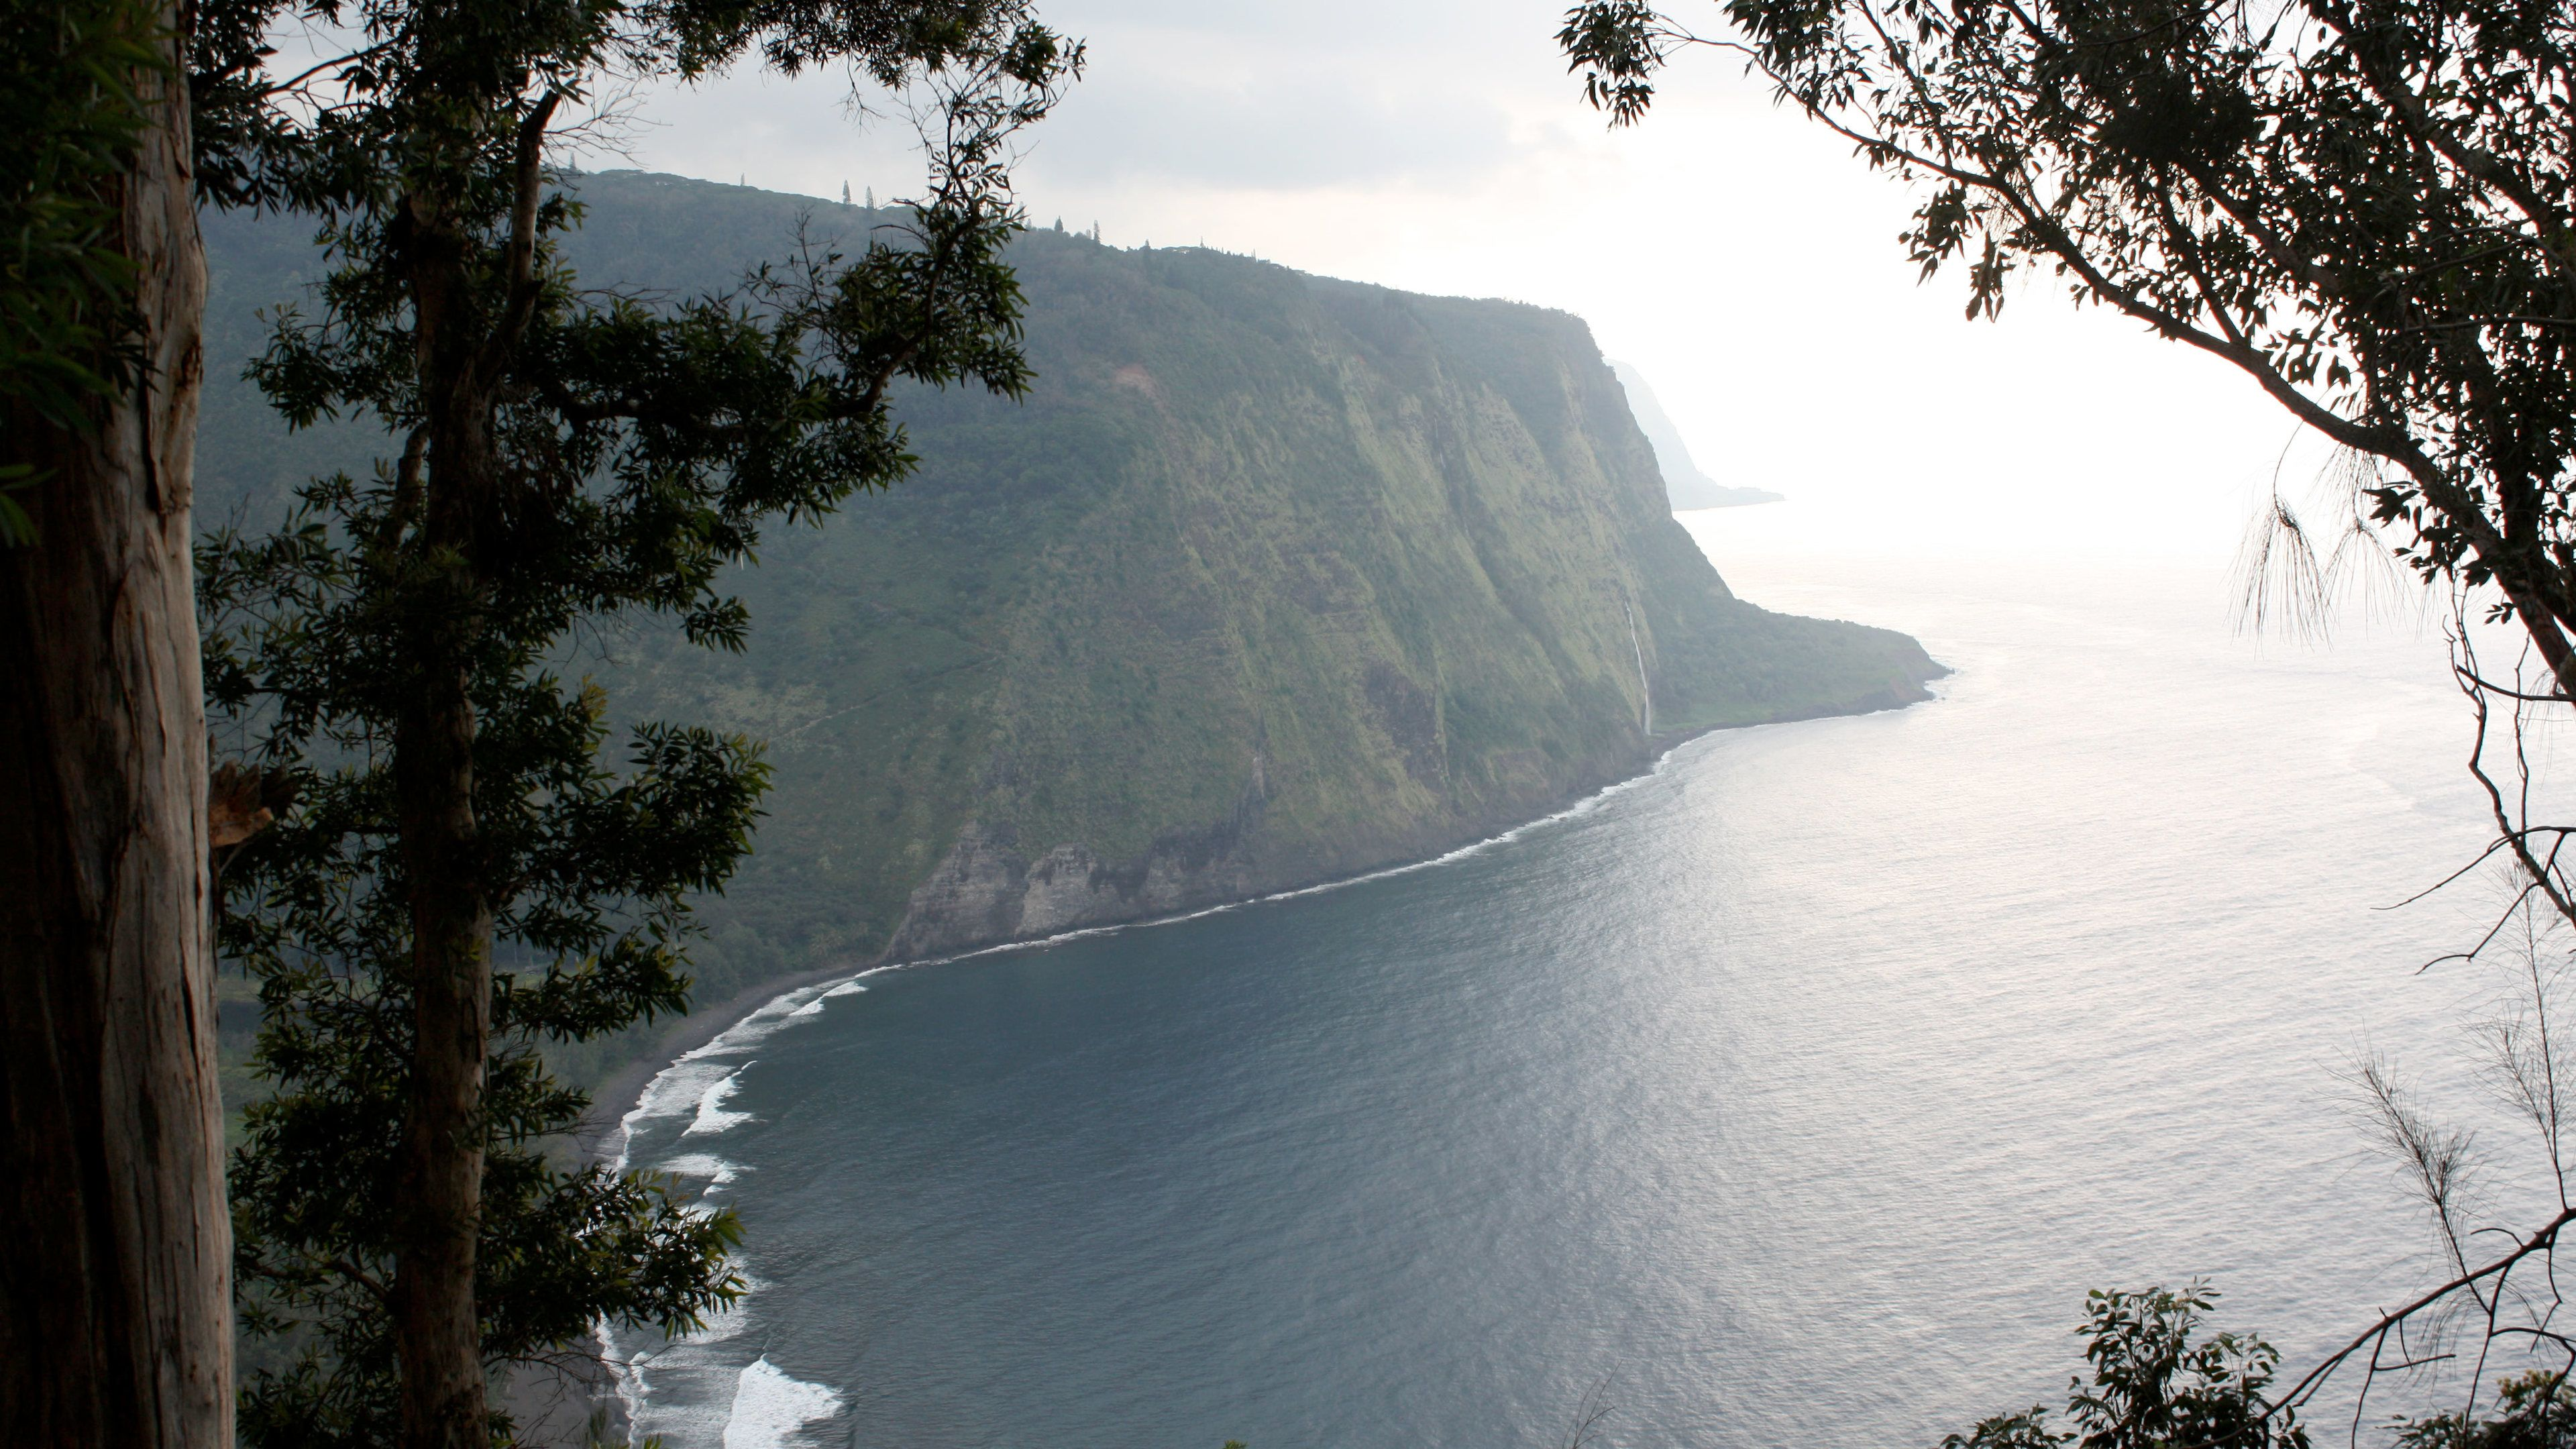 Overhead view of beautiful Big Island